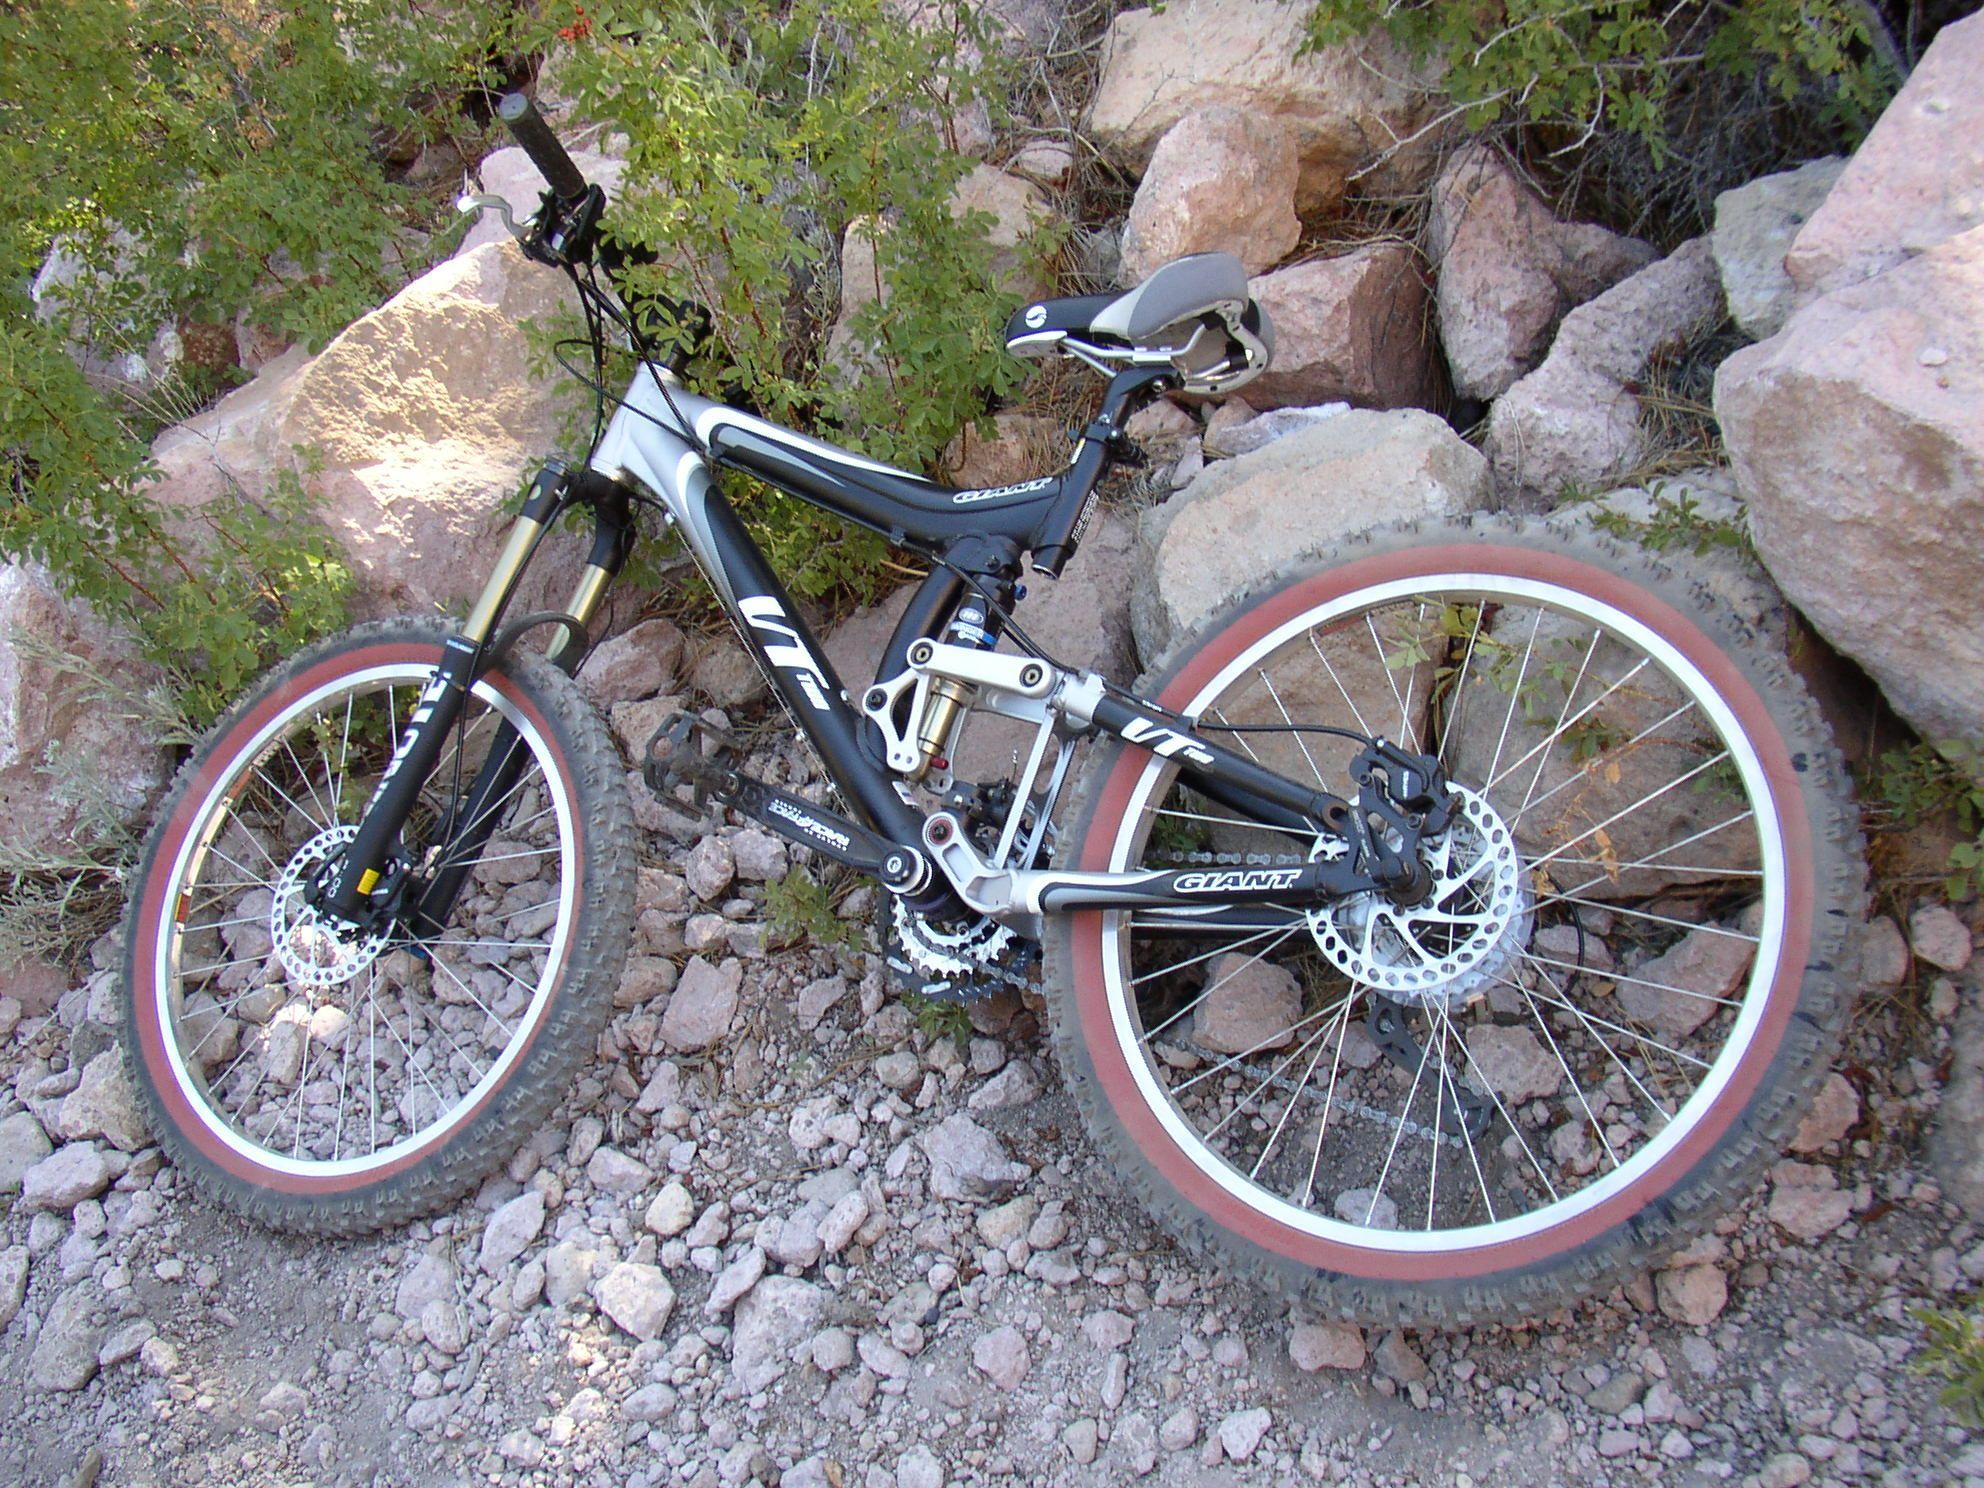 My Giant VT mountain bike